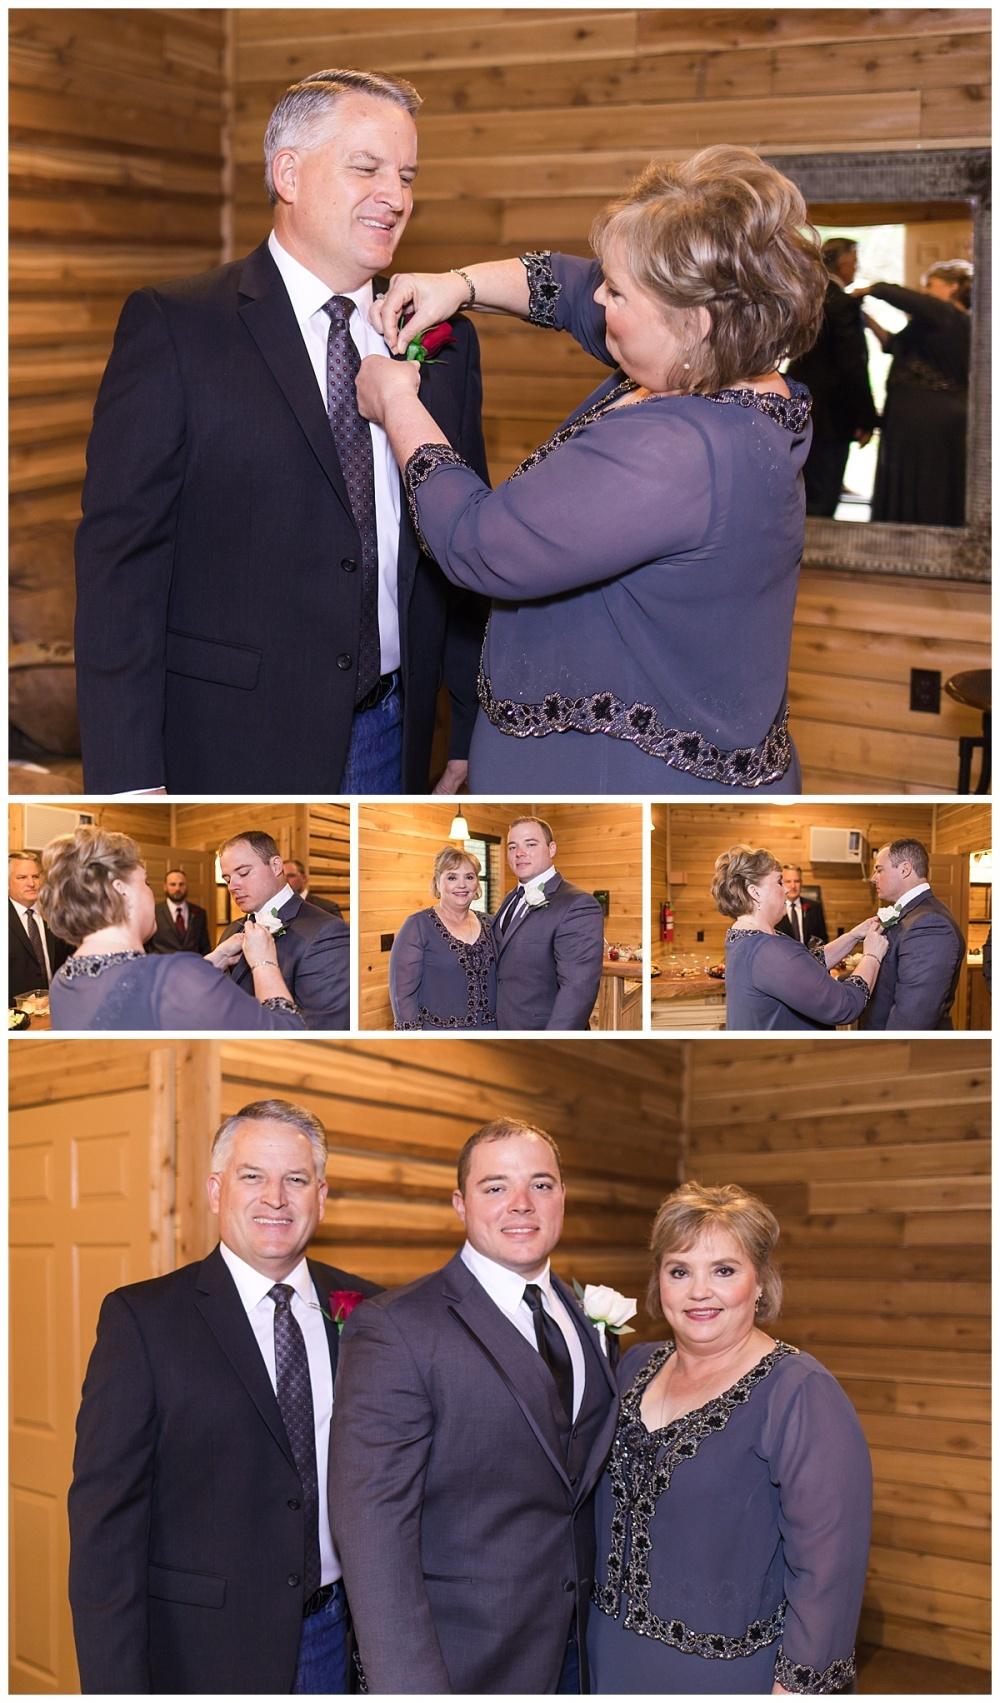 Carly-Barton-Photography-Geronimo-Oaks-Wedding-Venue-Texas-Hill-Country-Ronnie-Sarah_0087.jpg